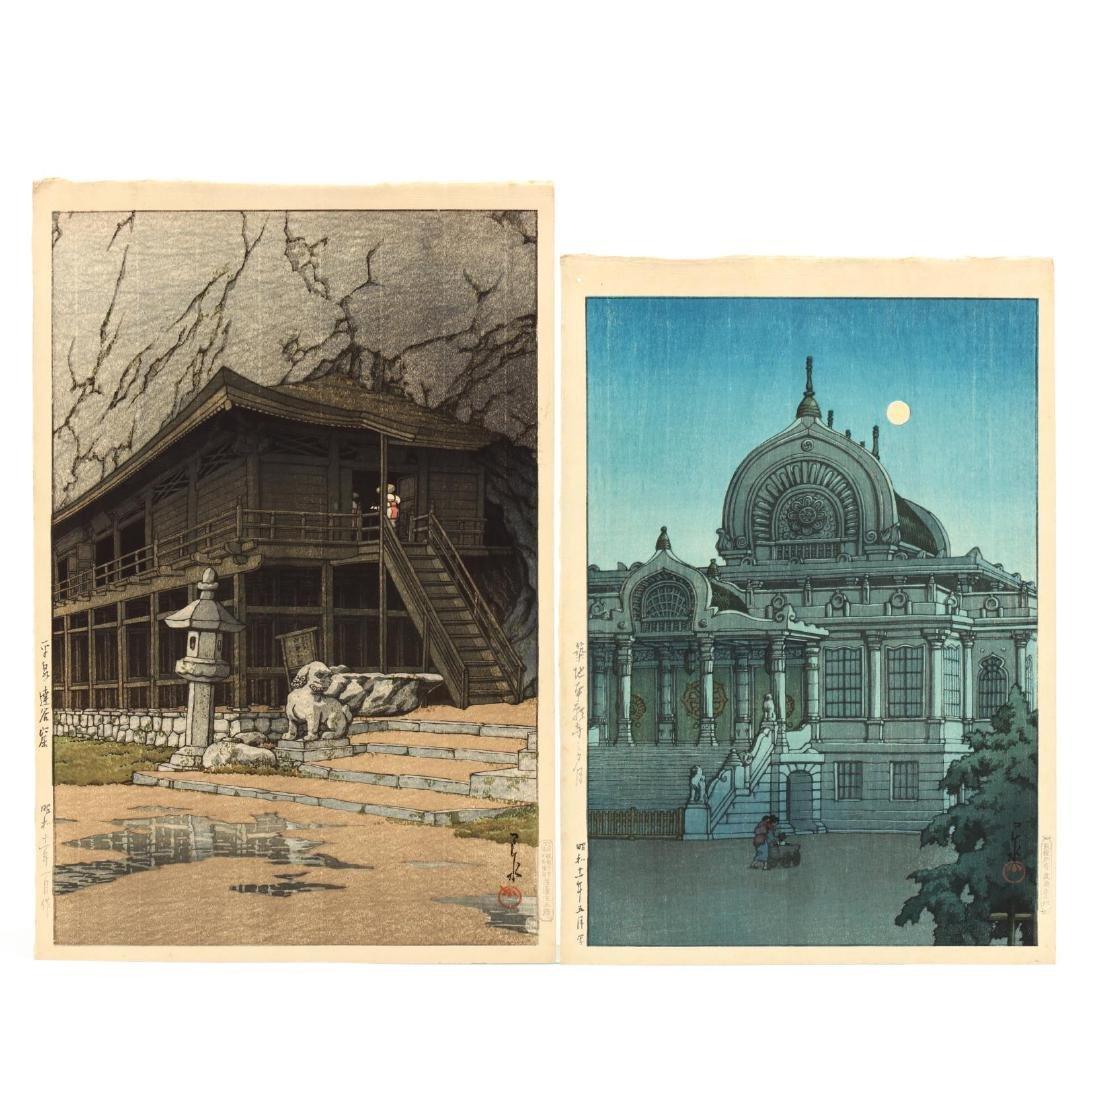 Two Japanese Woodblock Prints by Hasui Kawase